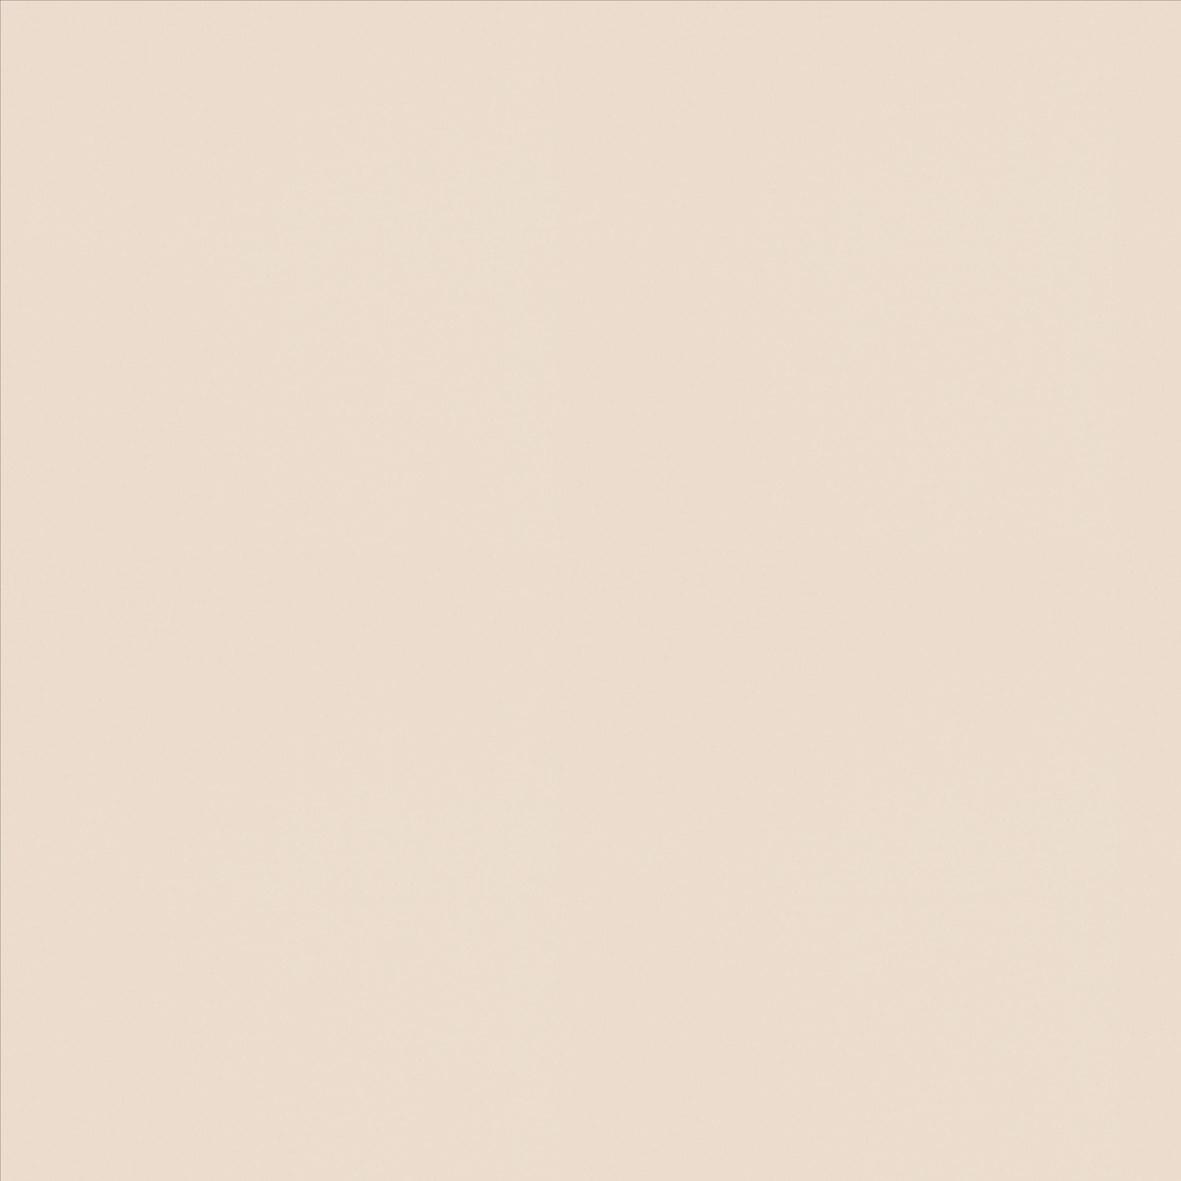 Roller_Swatch_Palette_Magnolia_RE0021